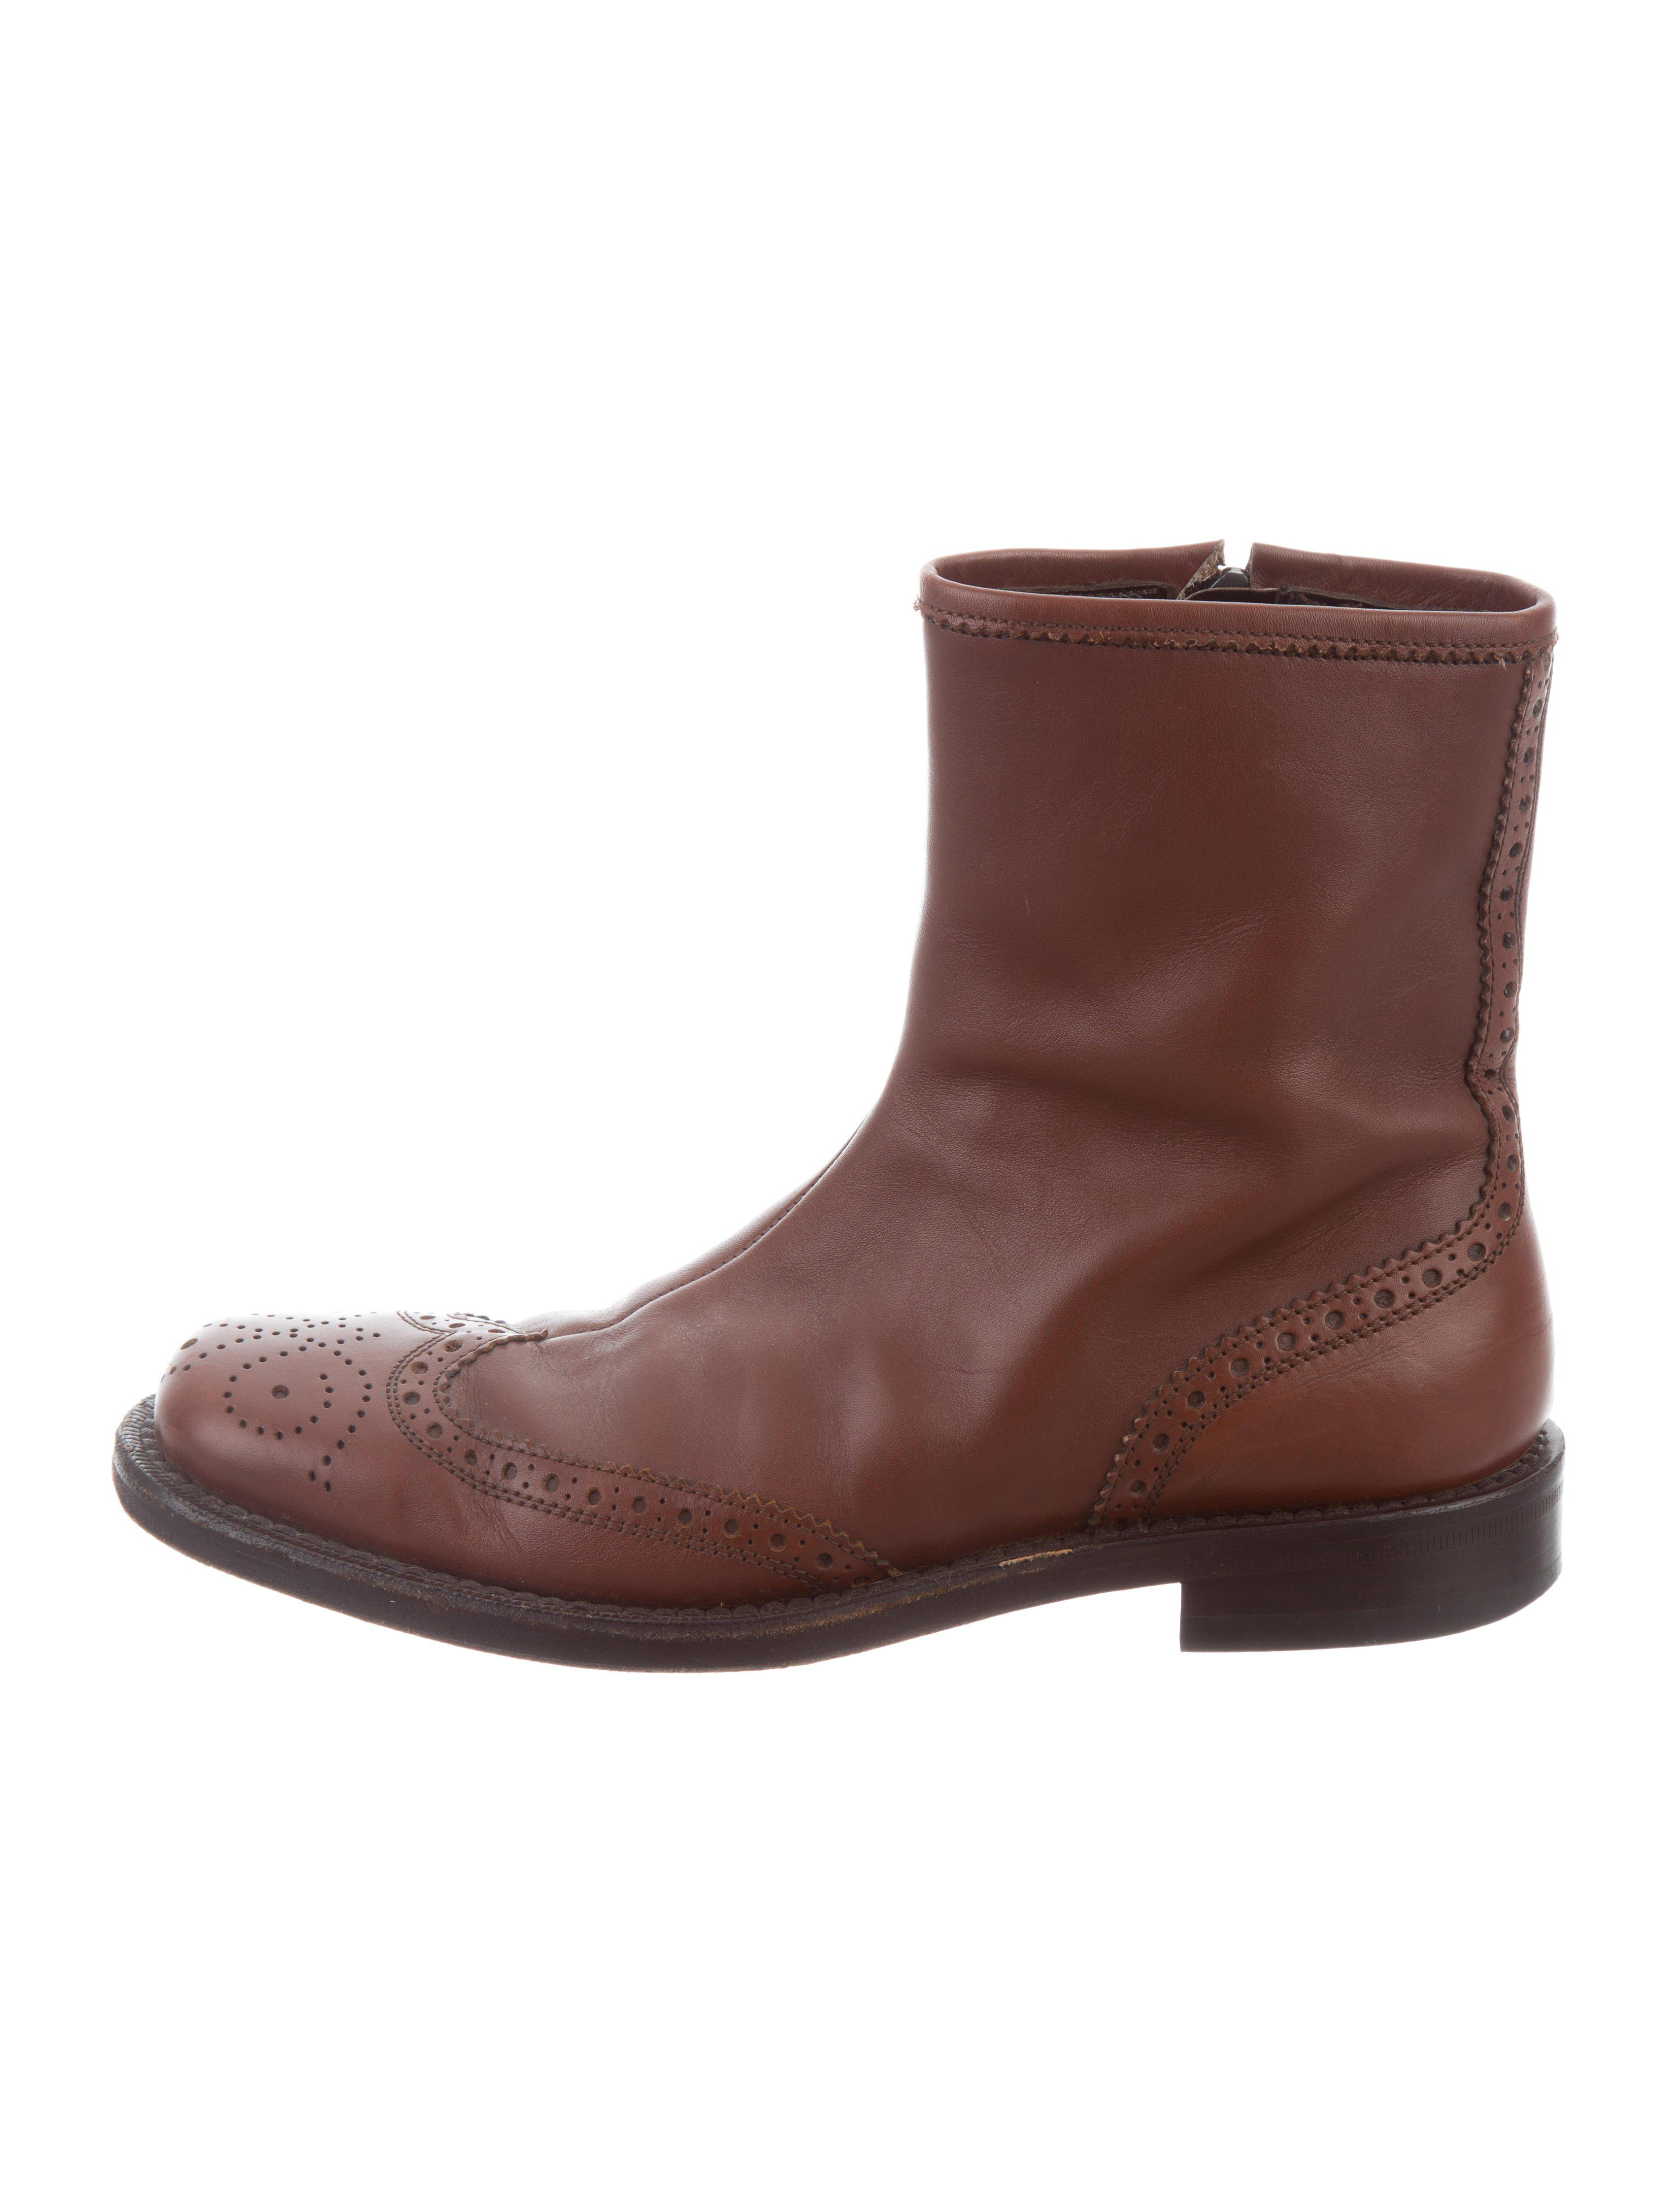 Miu Miu Wingtip Brogue Ankle Boots discount codes really cheap GSHCOe